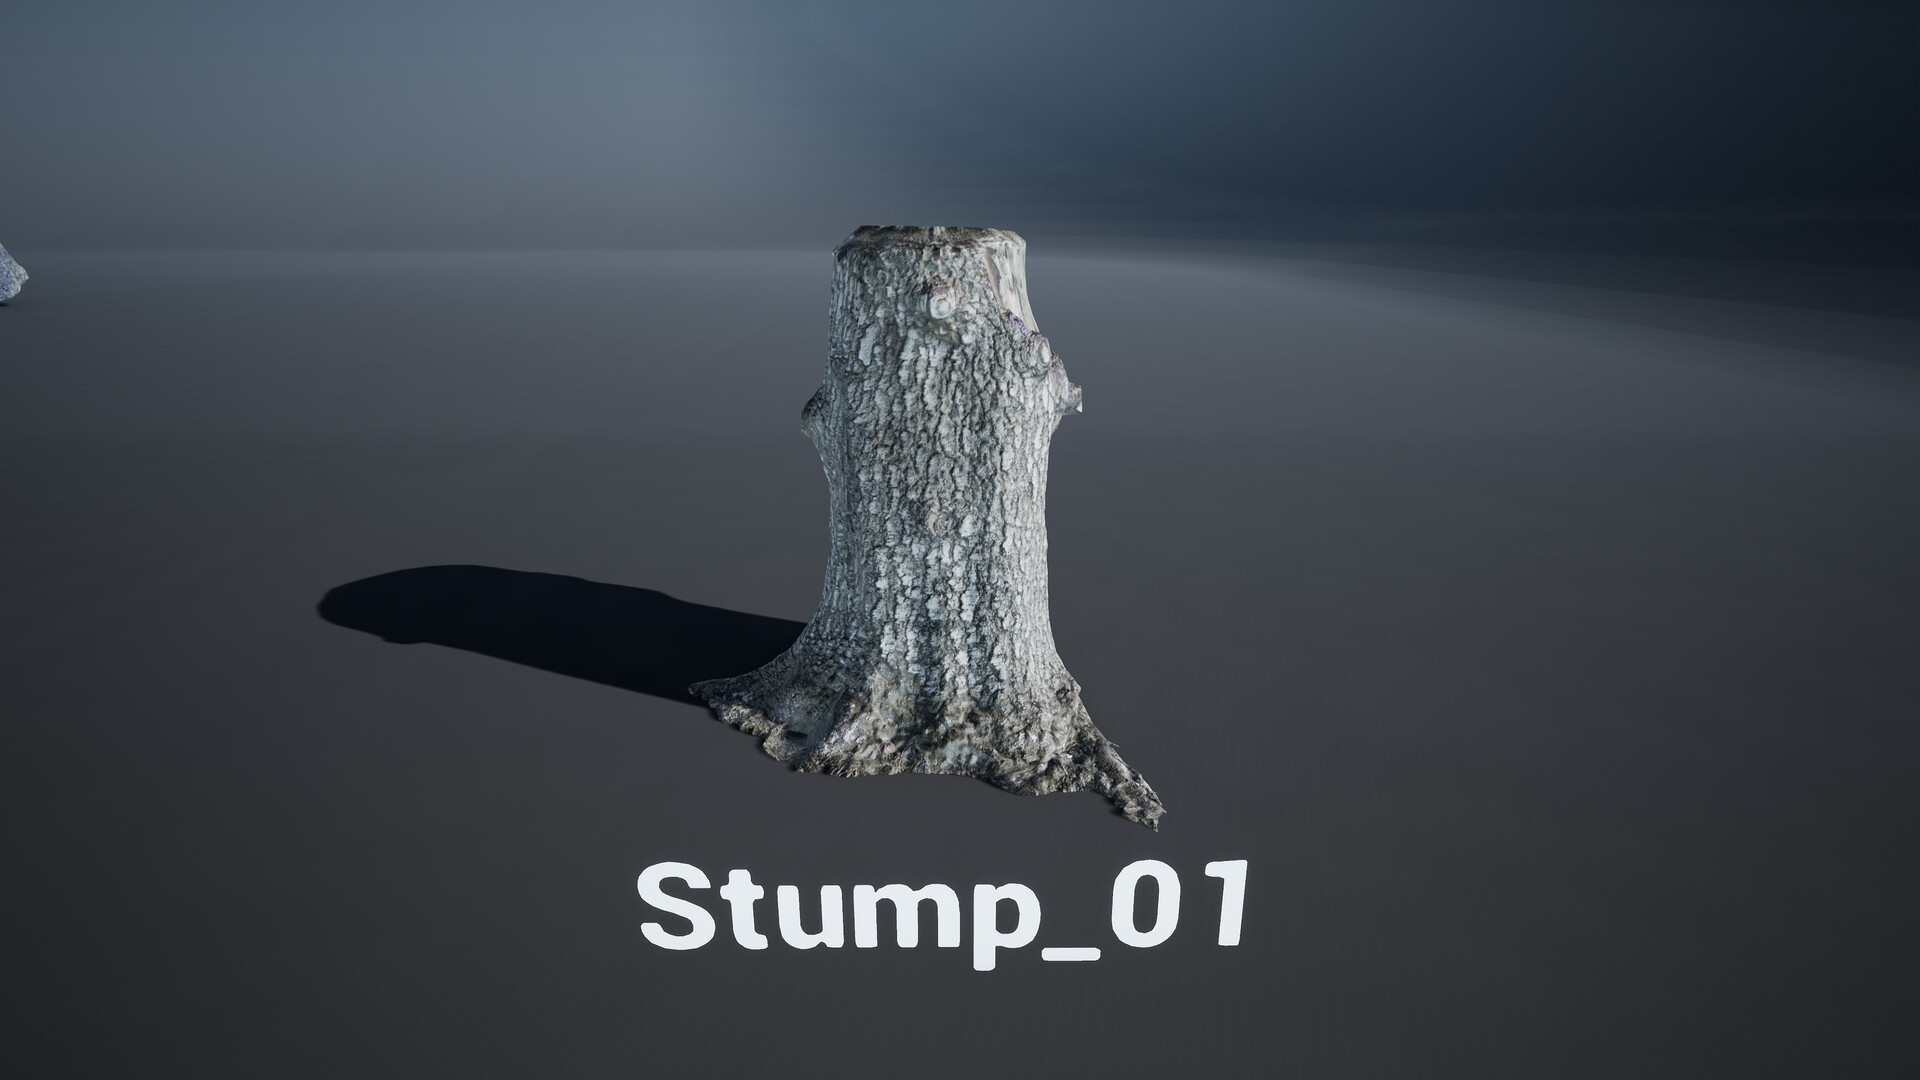 Stefan oprisan stump